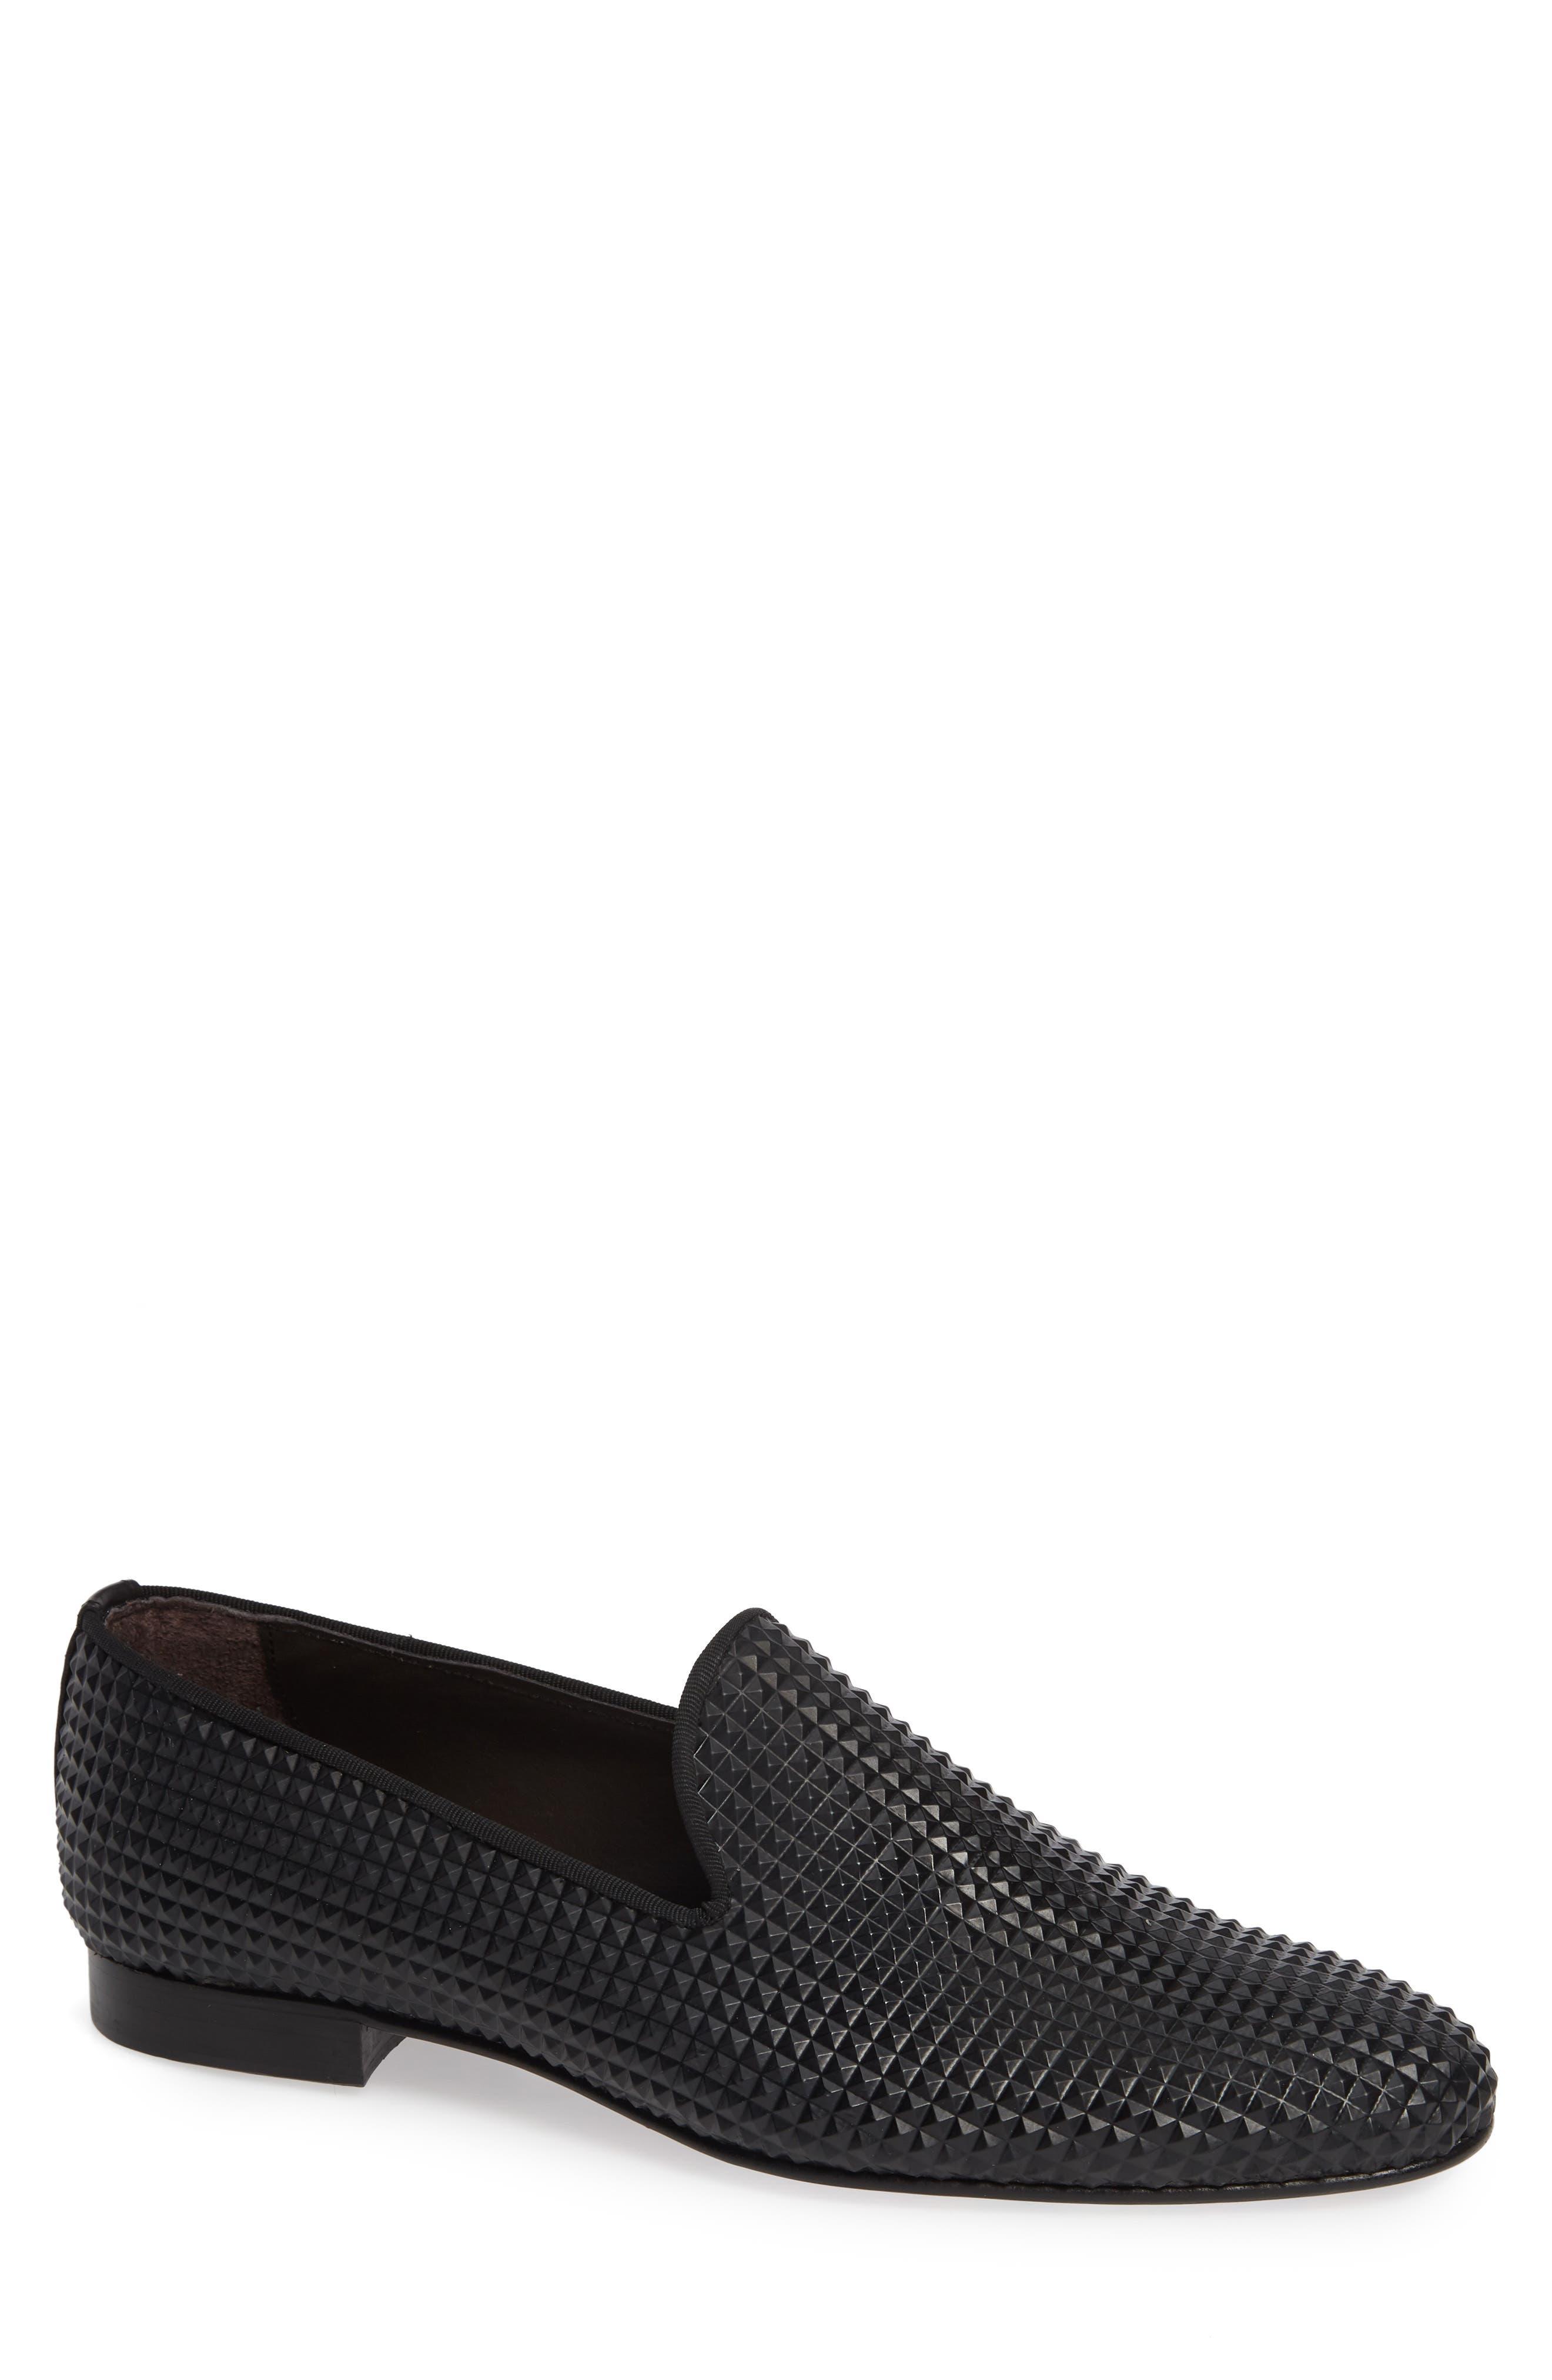 Milan Studded Venetian Loafer,                             Main thumbnail 1, color,                             BLACK